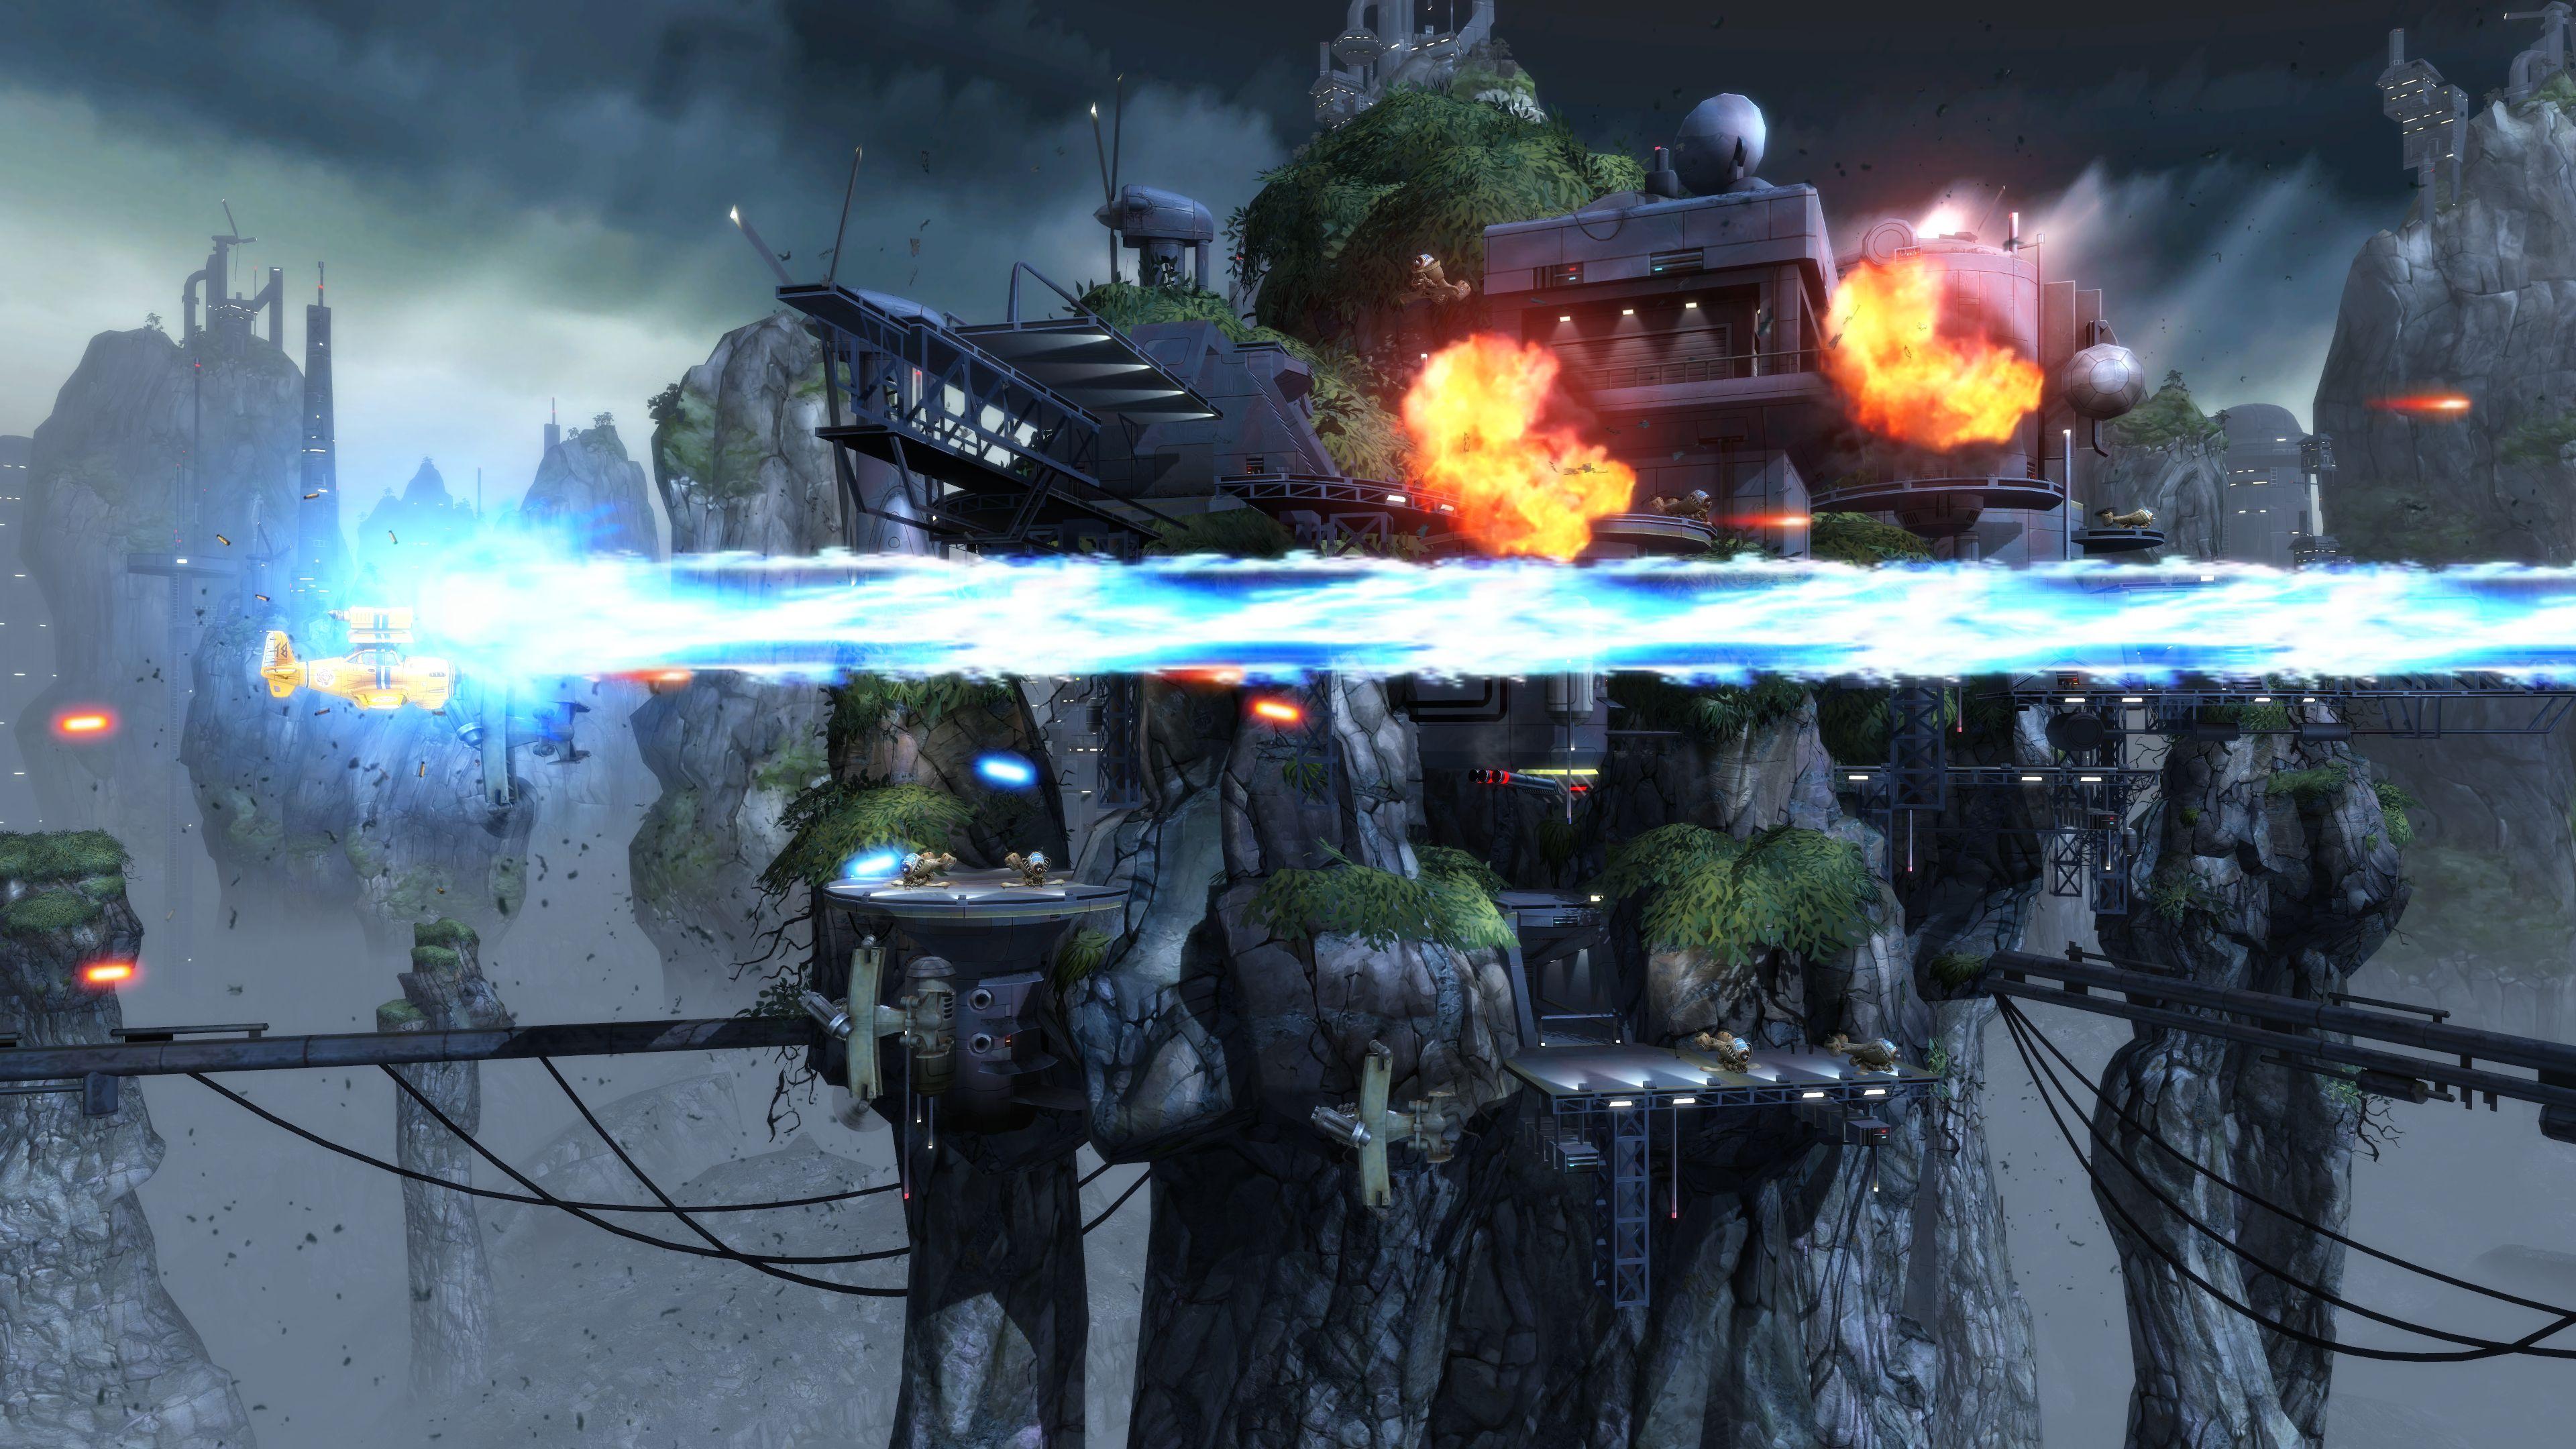 Hry pro Switch se rozrostou o Battle Chasers: Nightwar a Sine Mora EX 142159